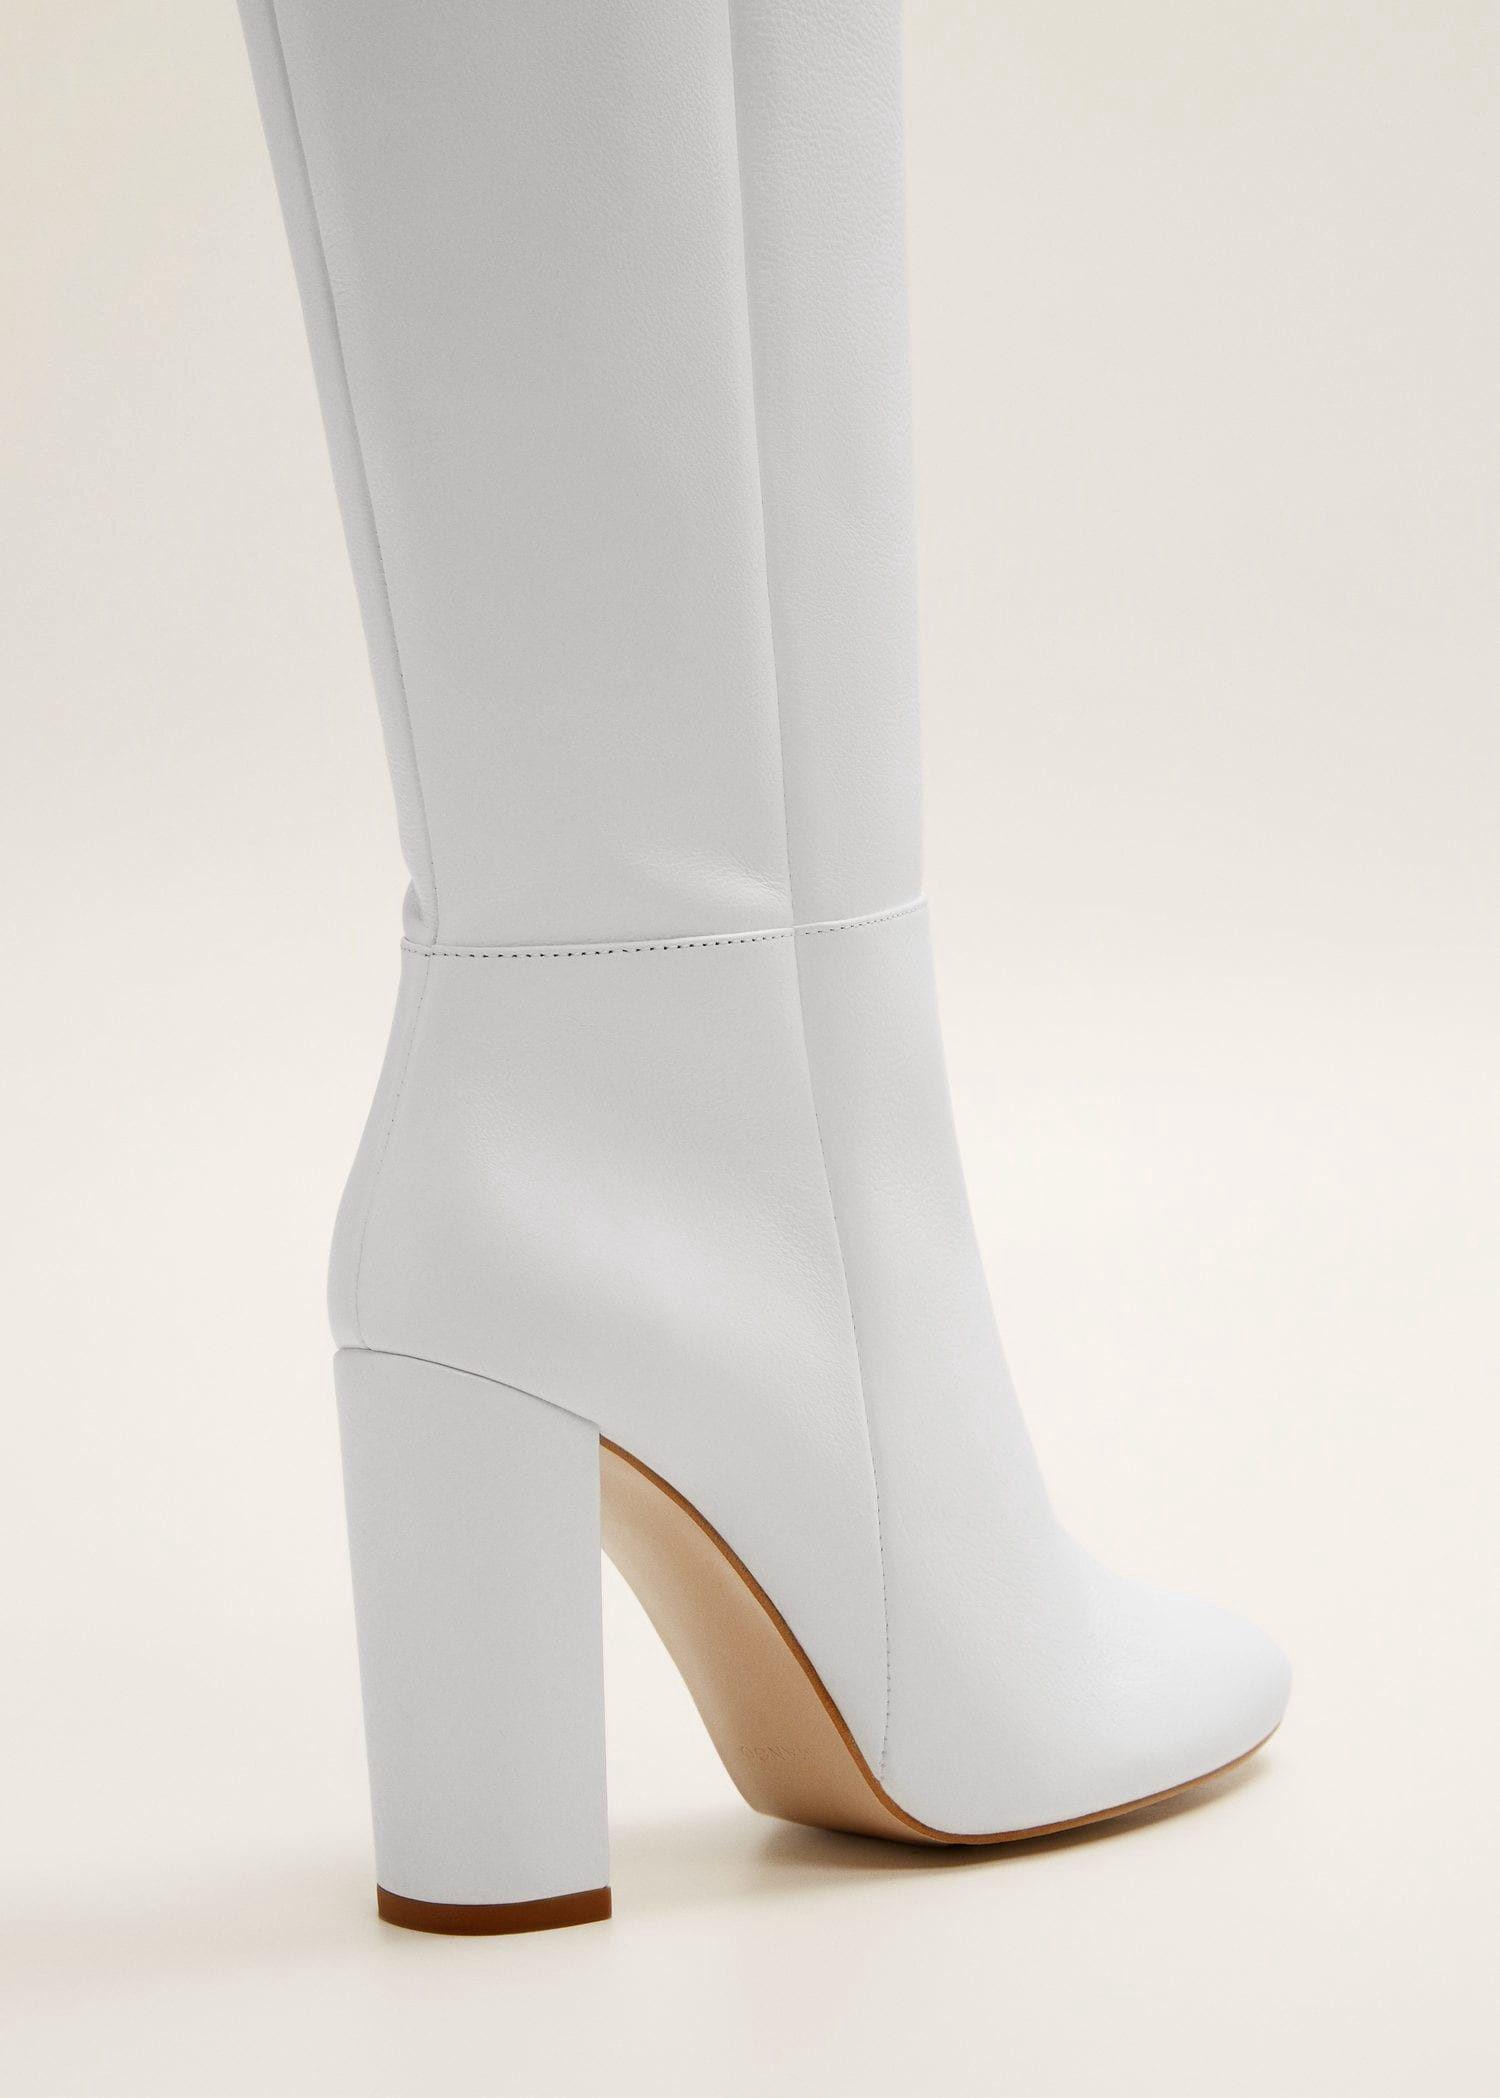 Mango Leather High-Leg Boots - White 9½